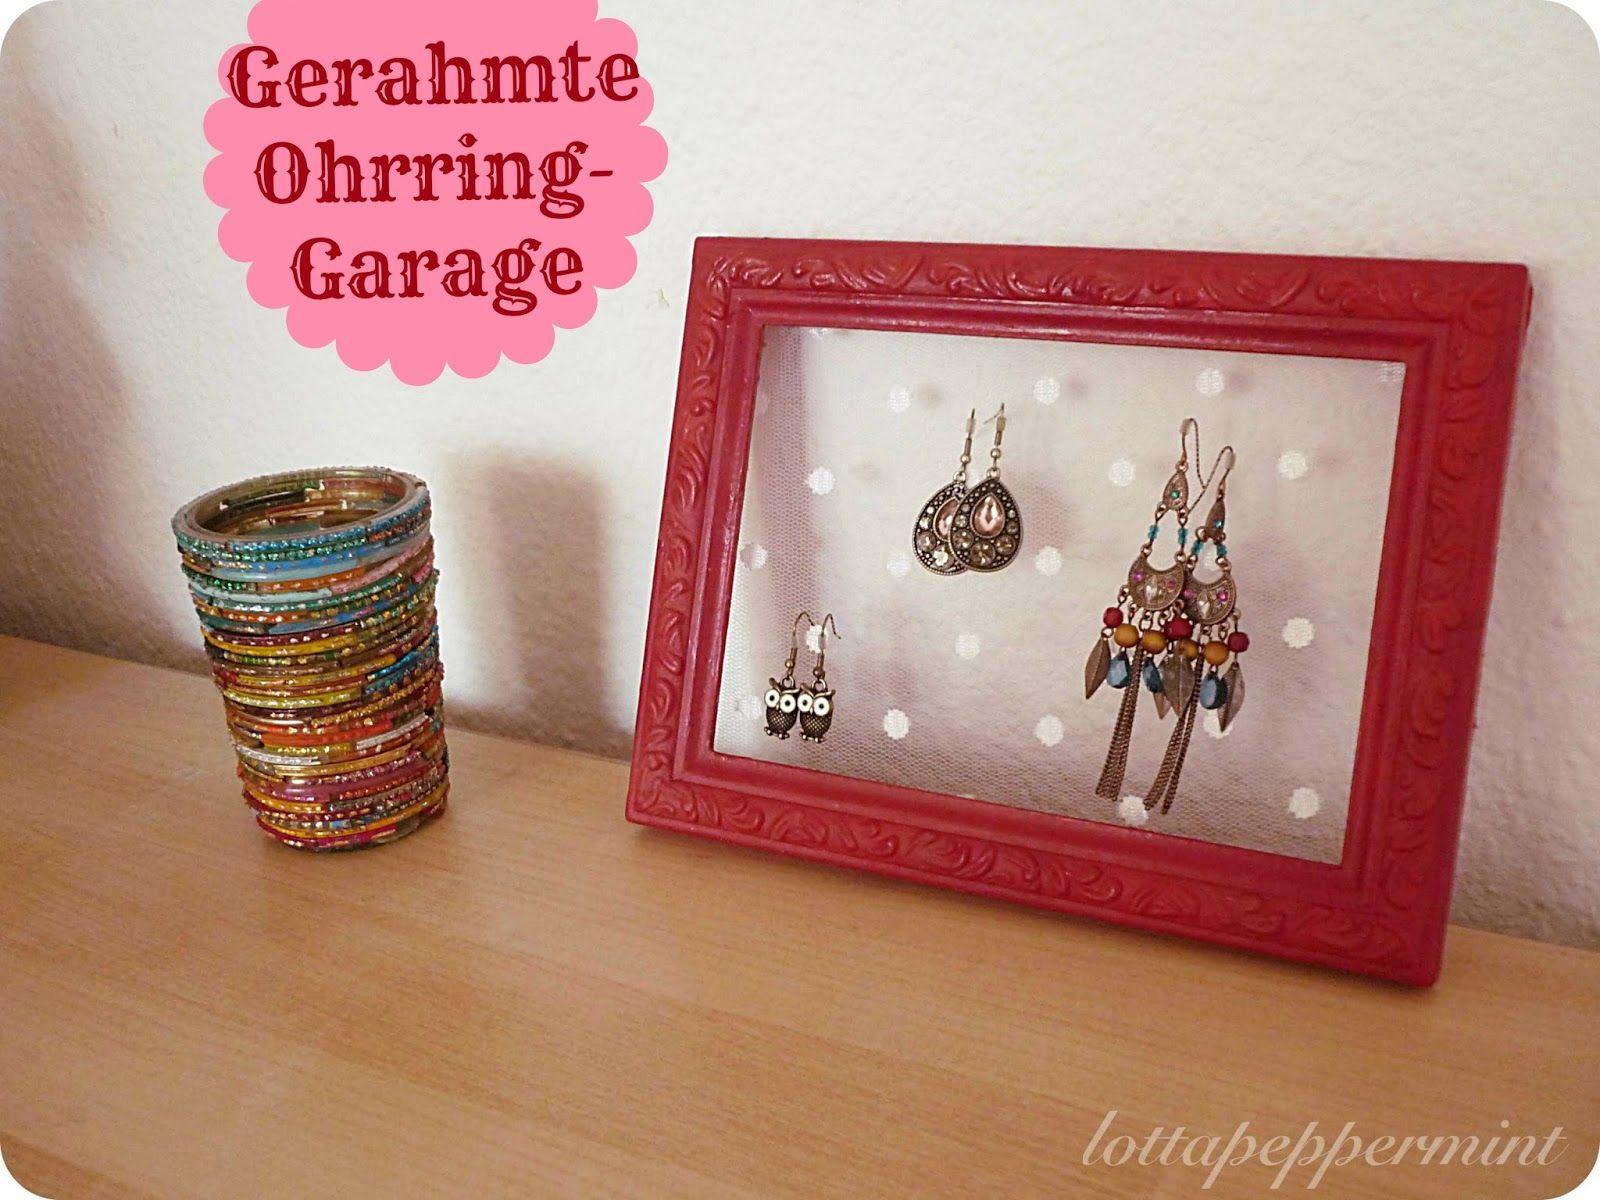 DIY: Gerahmte Ohrring-Garage. Framed earring organizer.